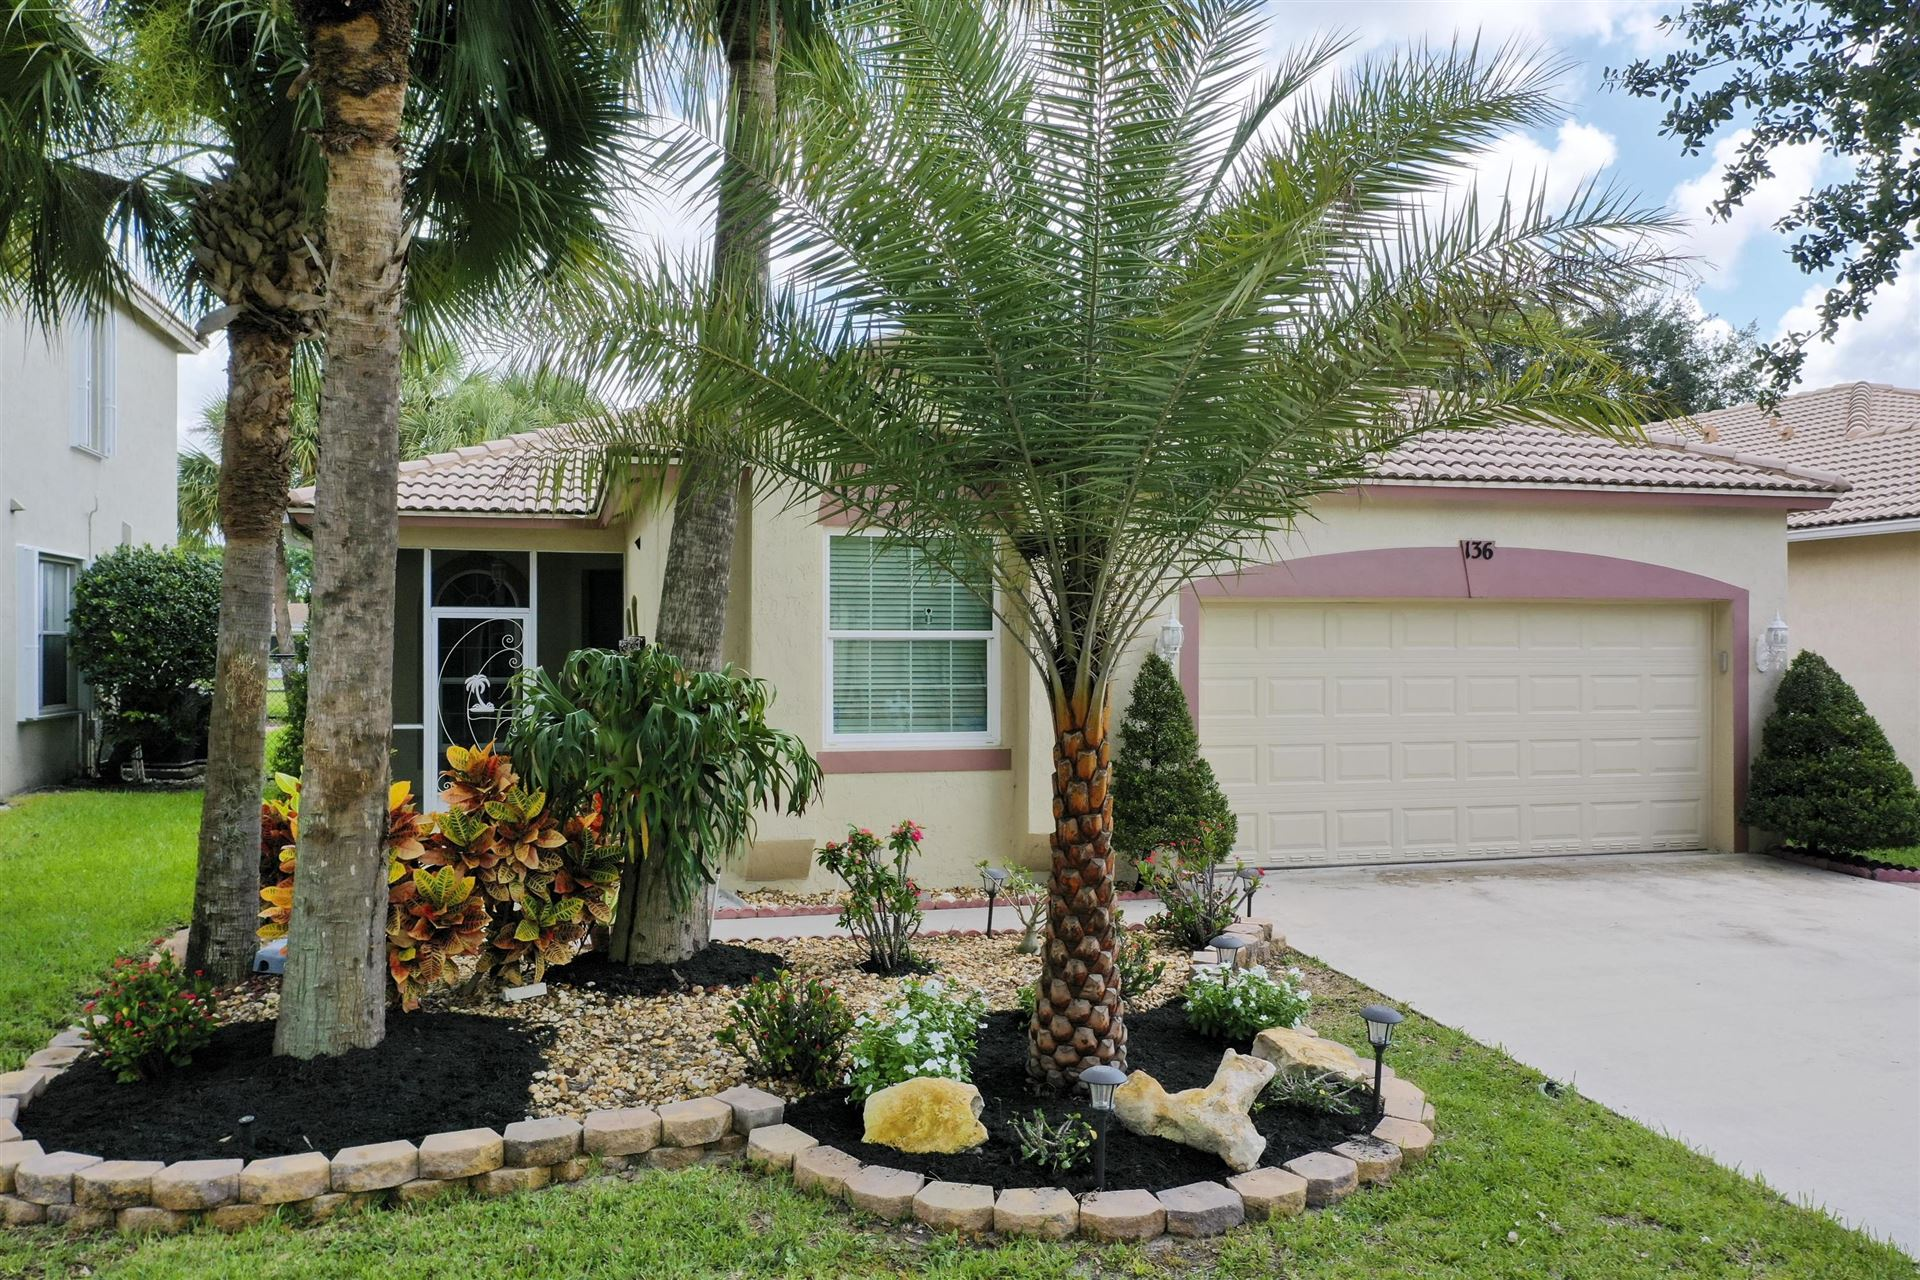 136 Seminole Lakes Drive, Royal Palm Beach, FL 33411 - #: RX-10633327